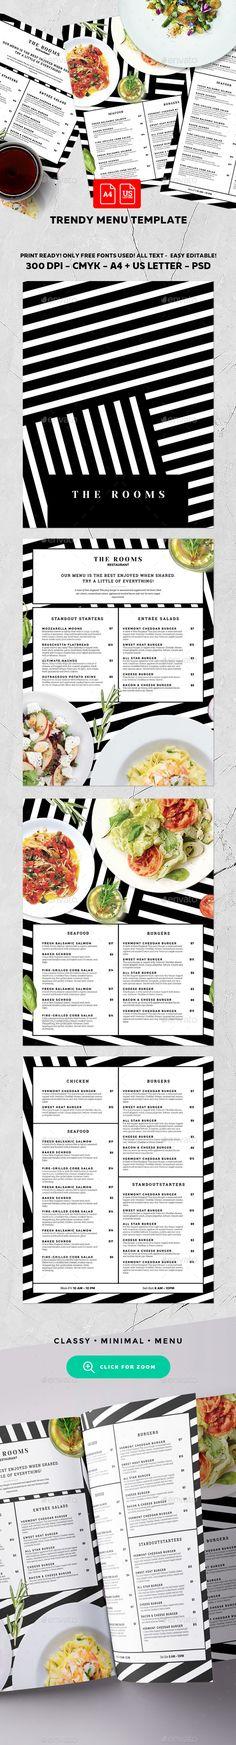 Menu Template Menu templates, Psd templates and Menu - a la carte menu template